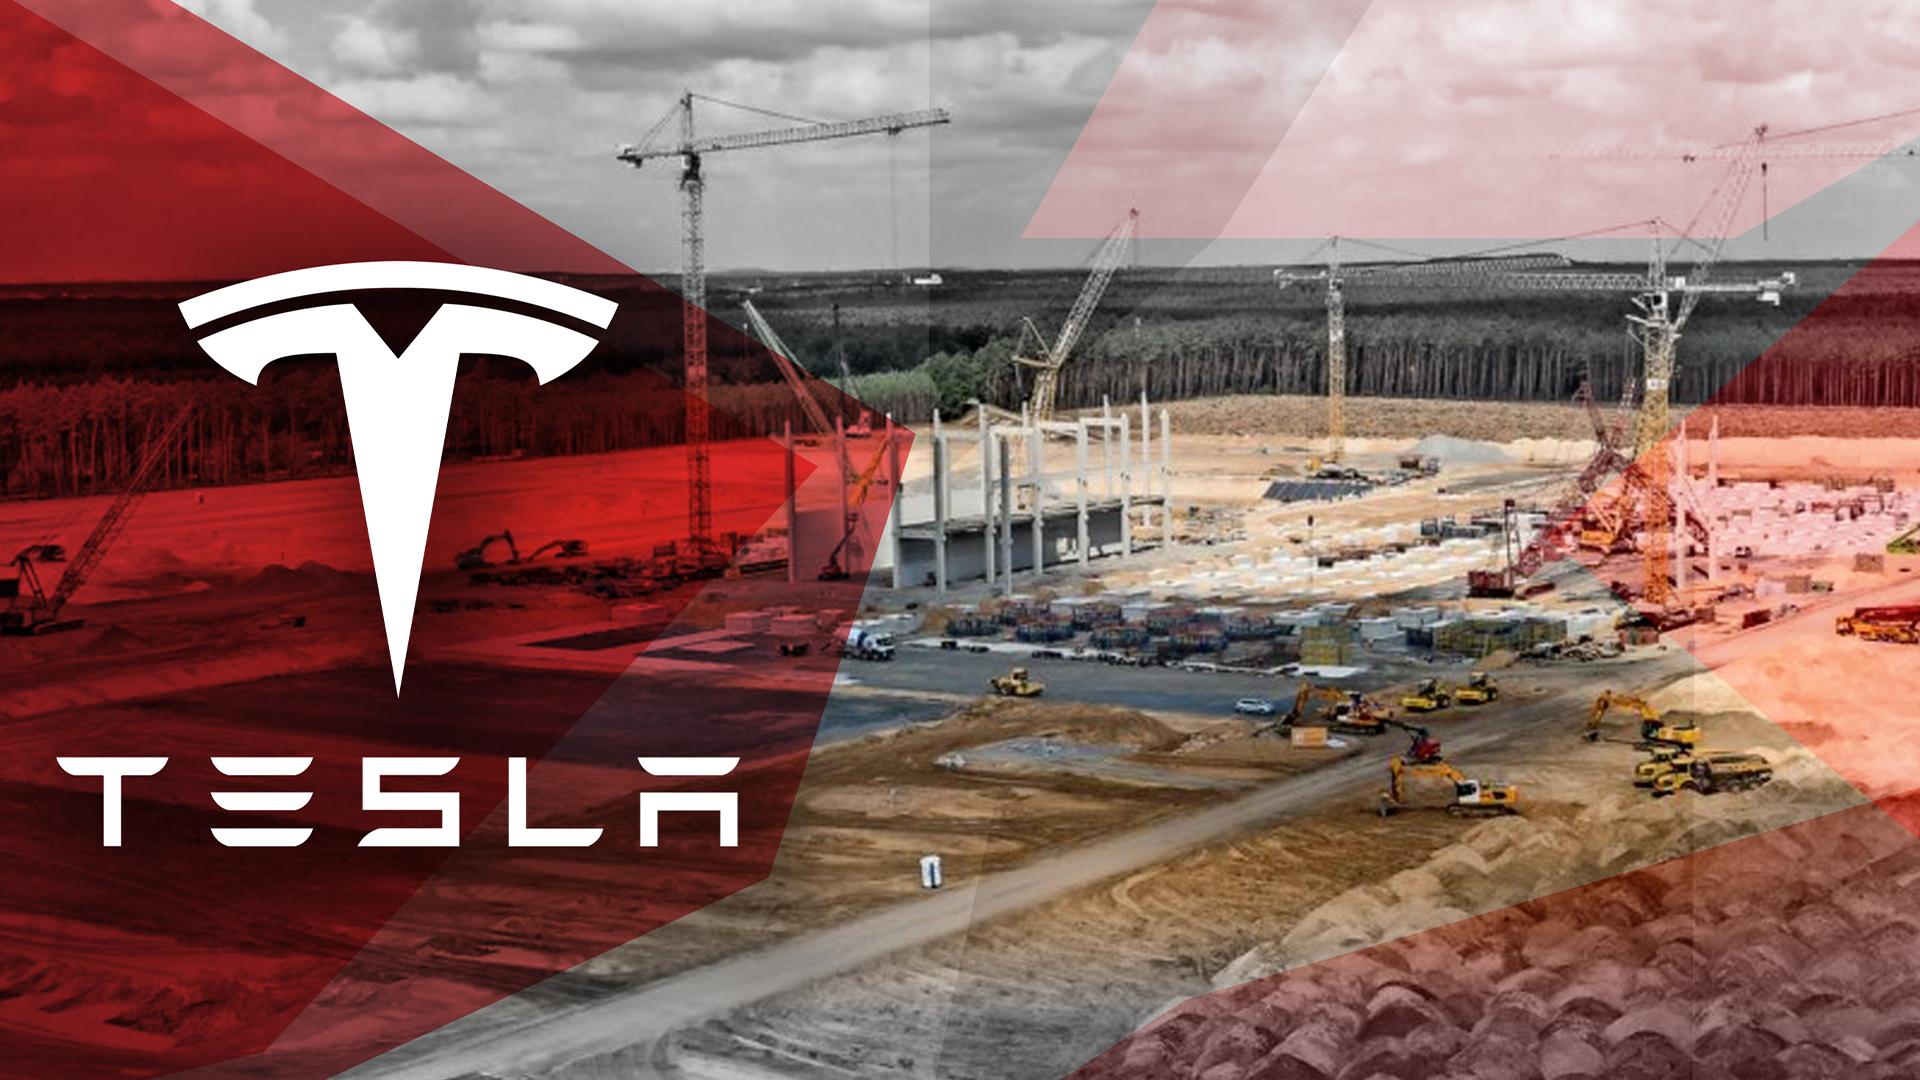 tesla, Tesla Motors, Fabrik, Gigafactory, Grünheide, Nevada, Gigafactory 4, Tesla Fabrik, Giga Berlin, Freienbrink, Tesla Brandenburg, Baustelle